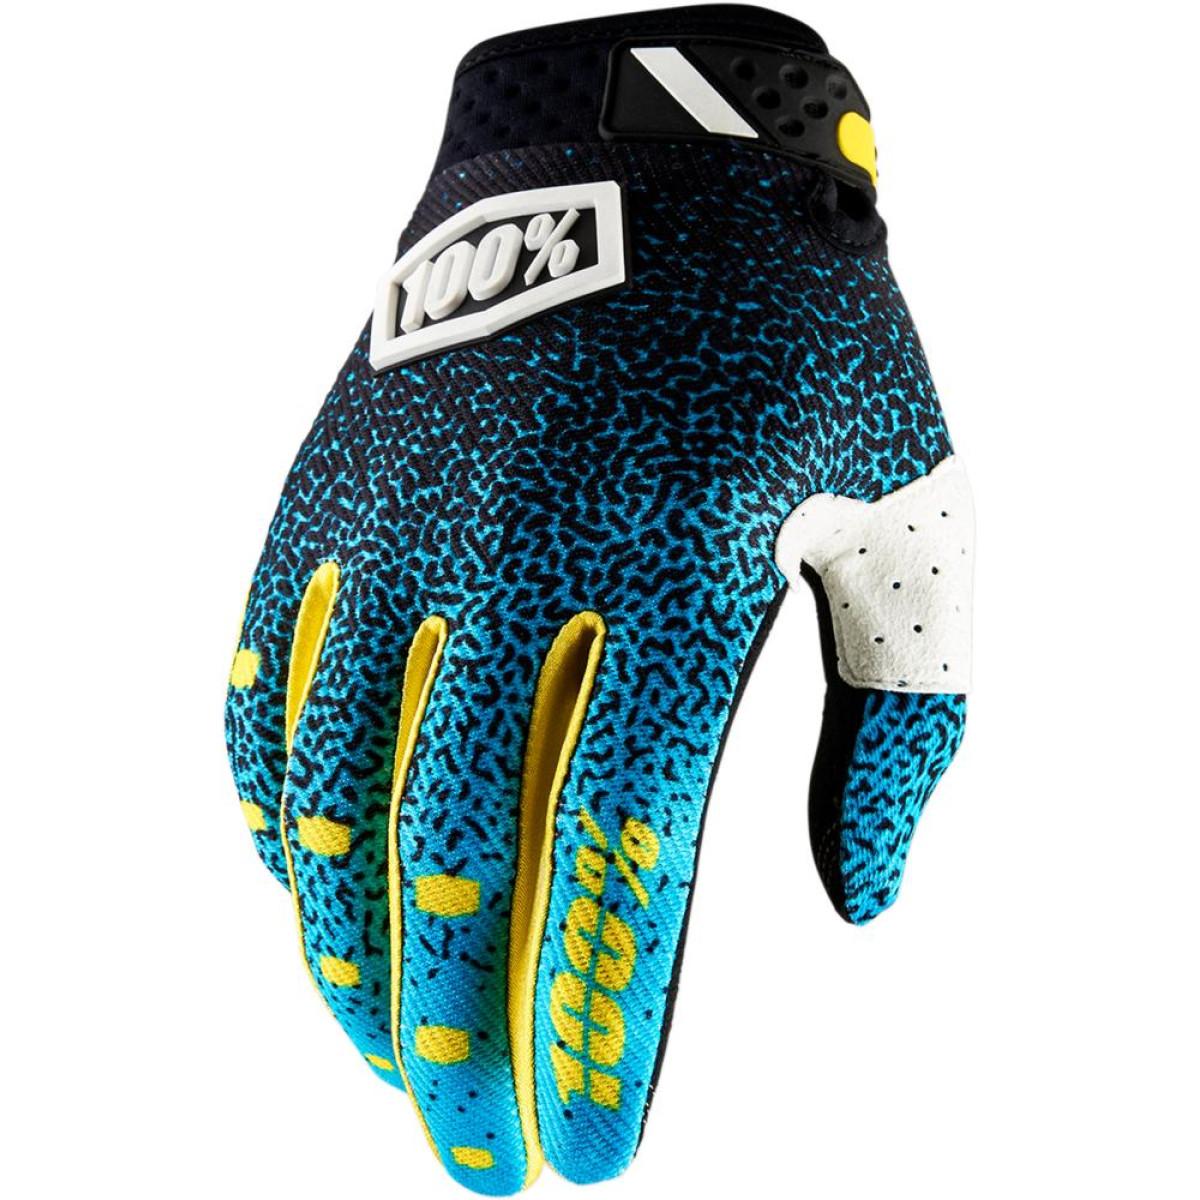 Motokrosové rukavice 100% RIDEFIT Cyan Black 2018 vel. L  35da0c3937